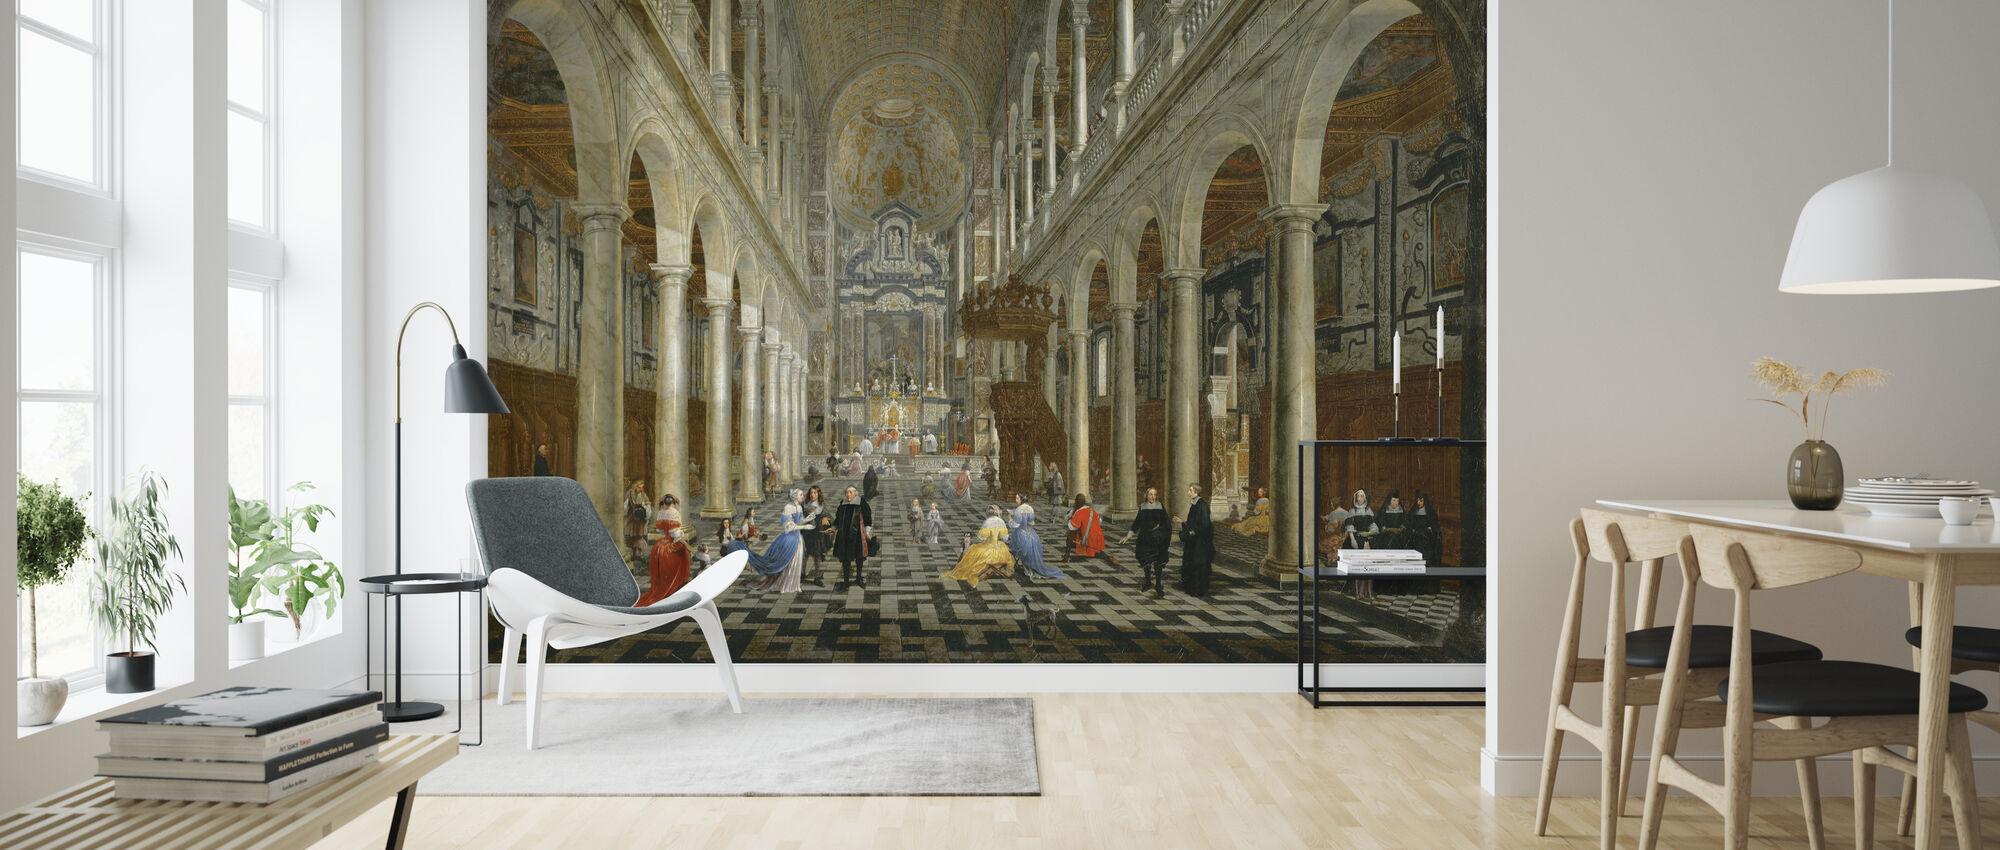 Interior of the Jesuit Church in Antwerp - Wallpaper - Living Room